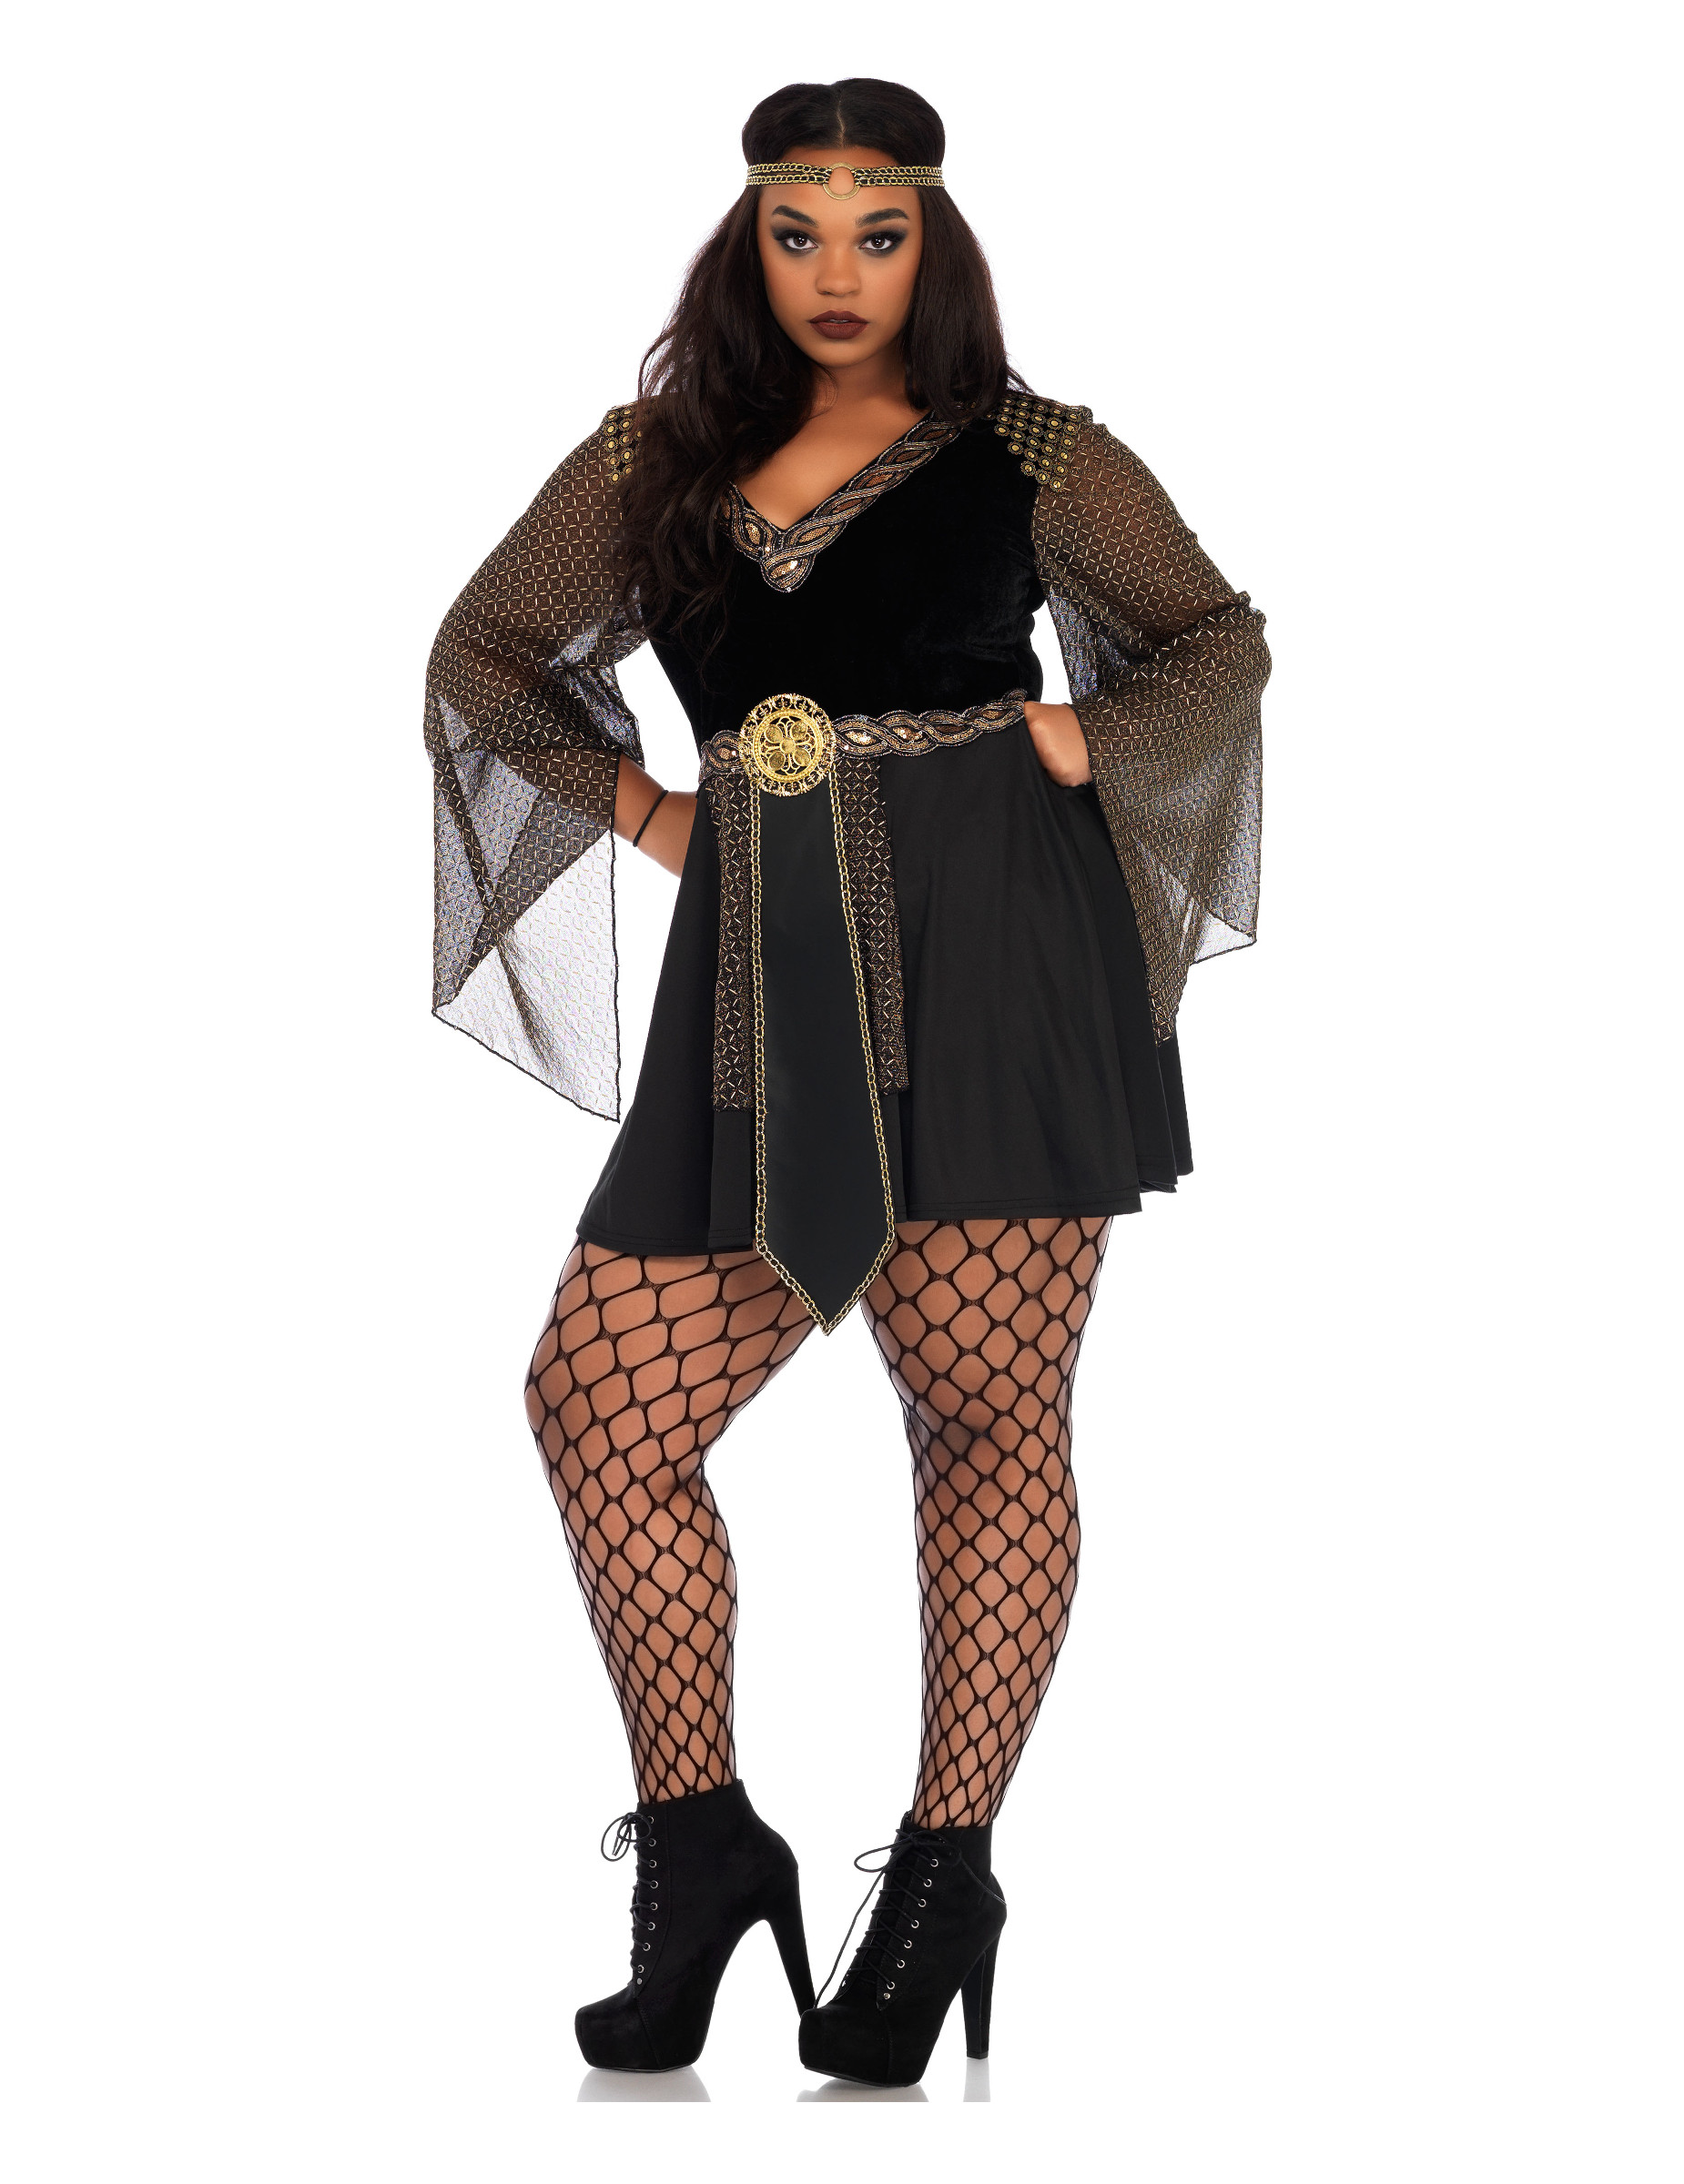 sexy gladiatorinnen kost m g nstige faschings kost me bei karneval megastore. Black Bedroom Furniture Sets. Home Design Ideas